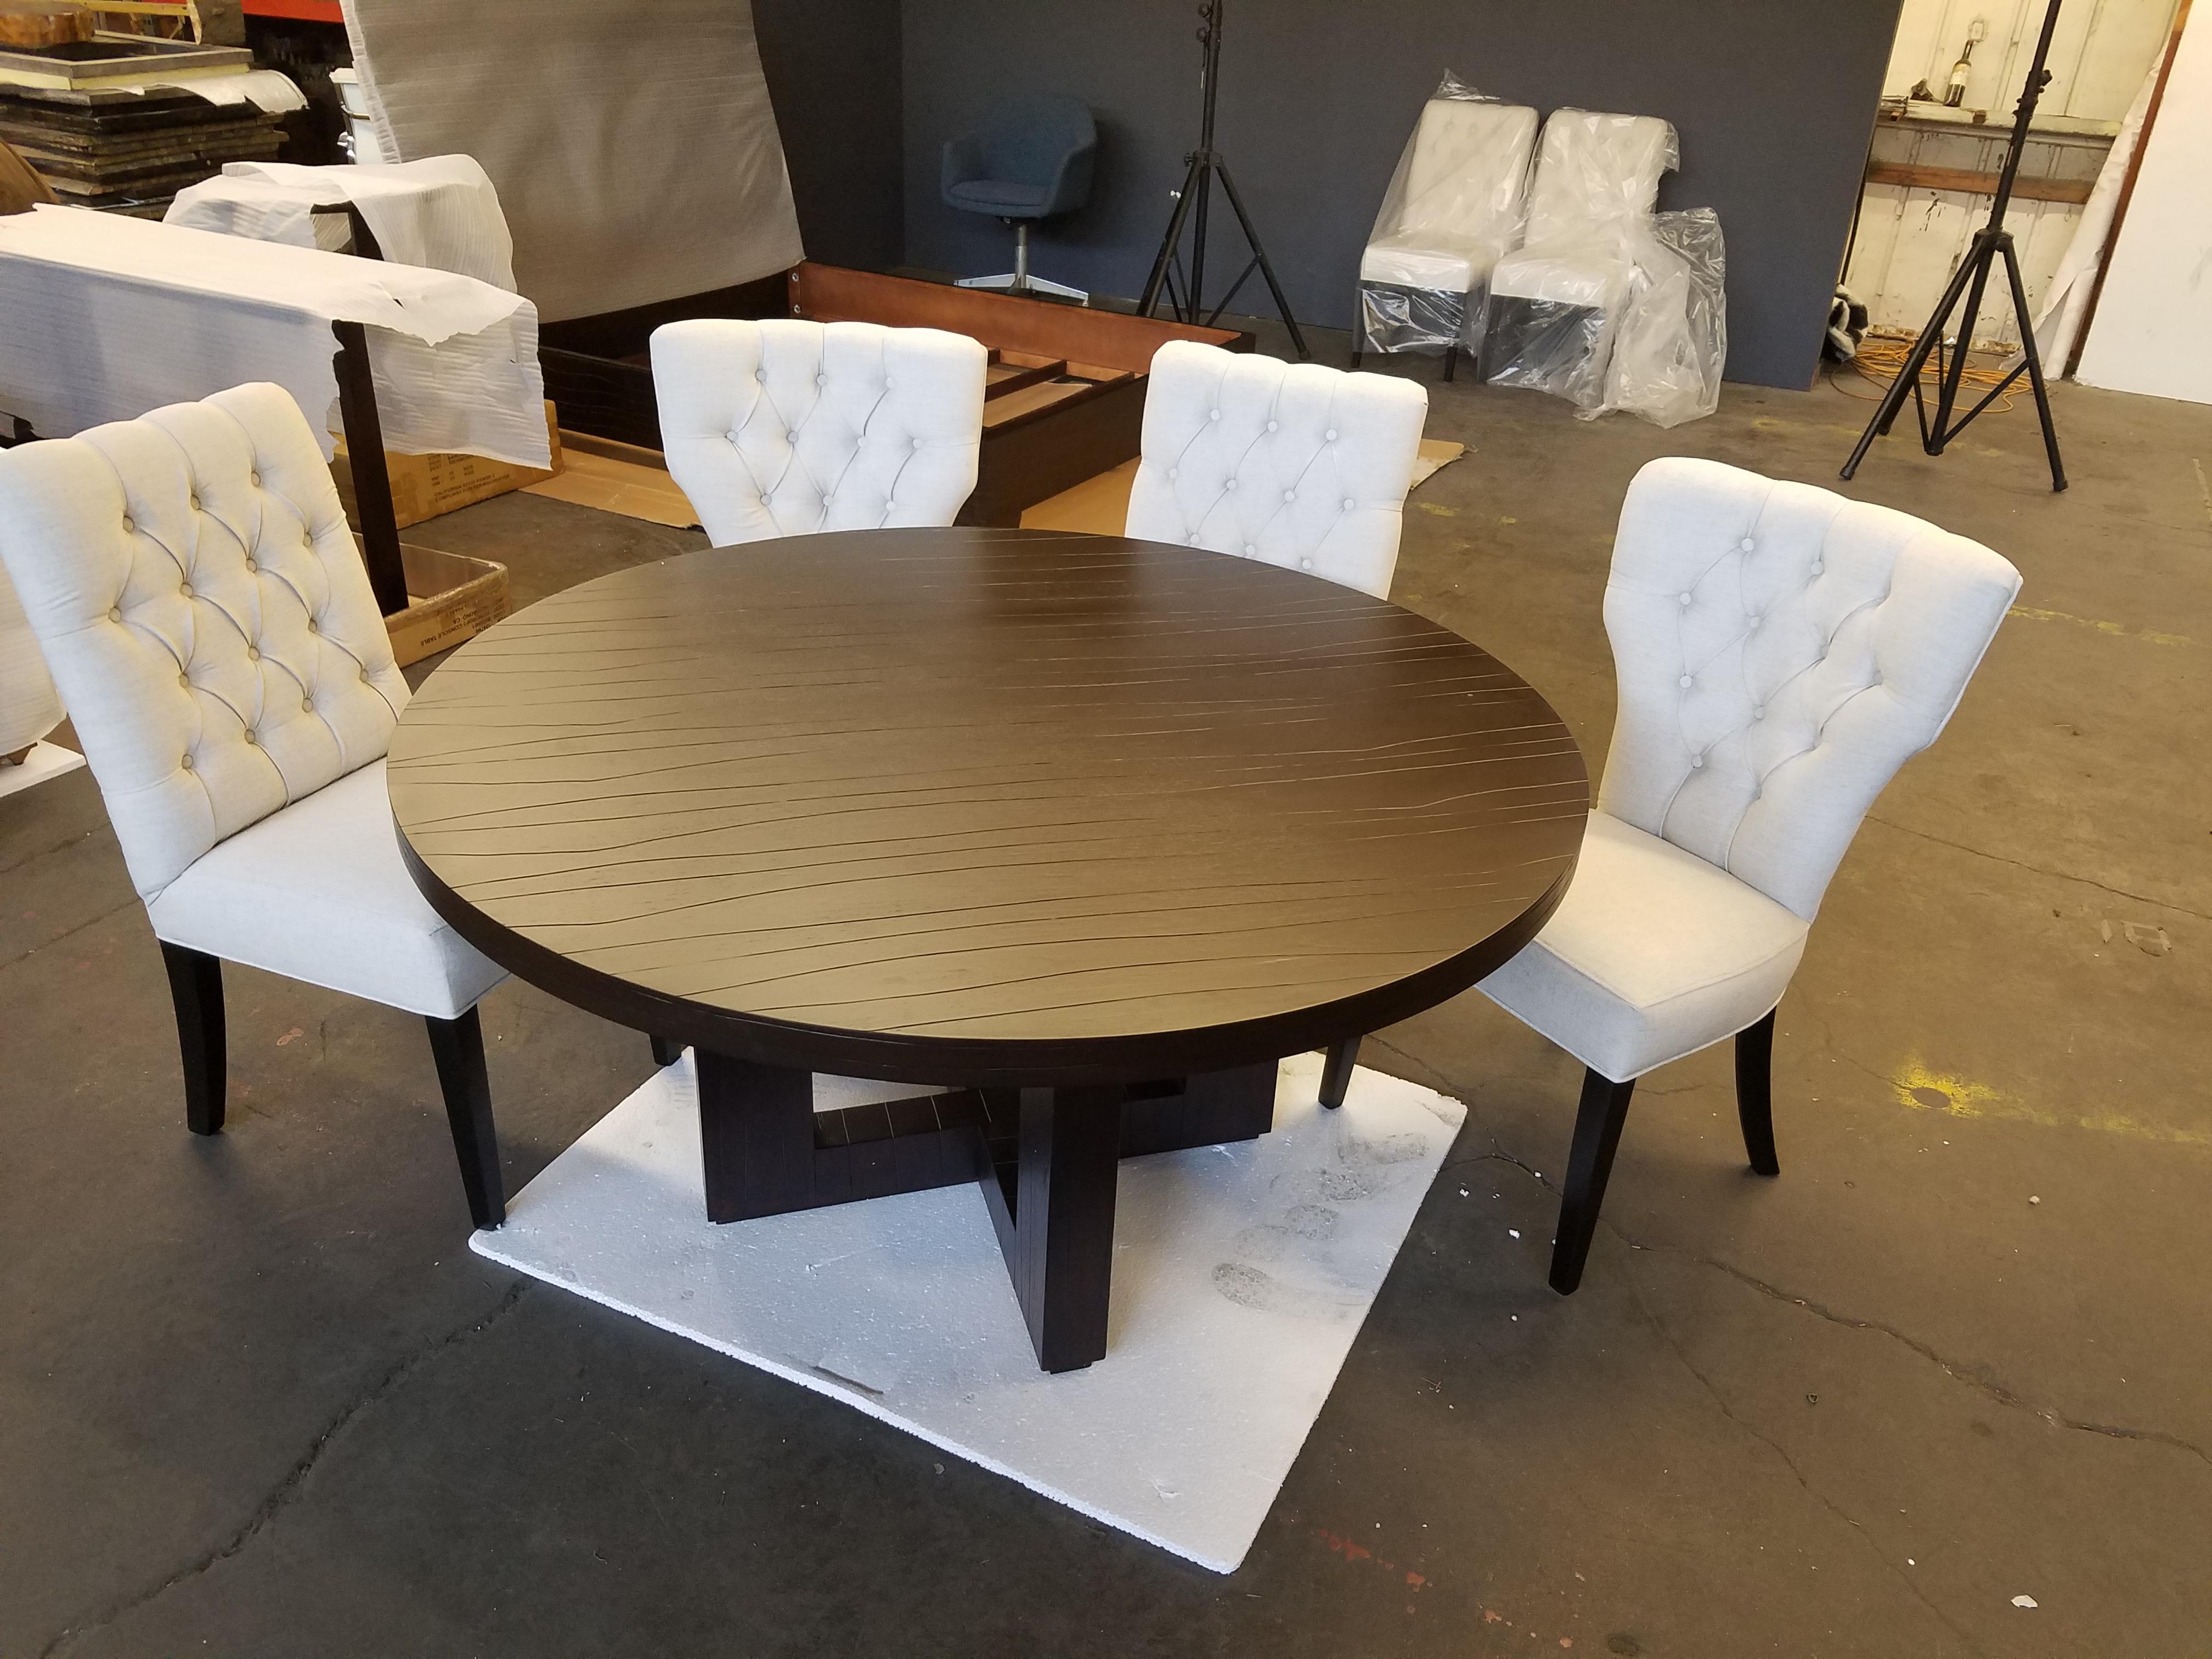 Brownstone Hampton table, $ 975.00